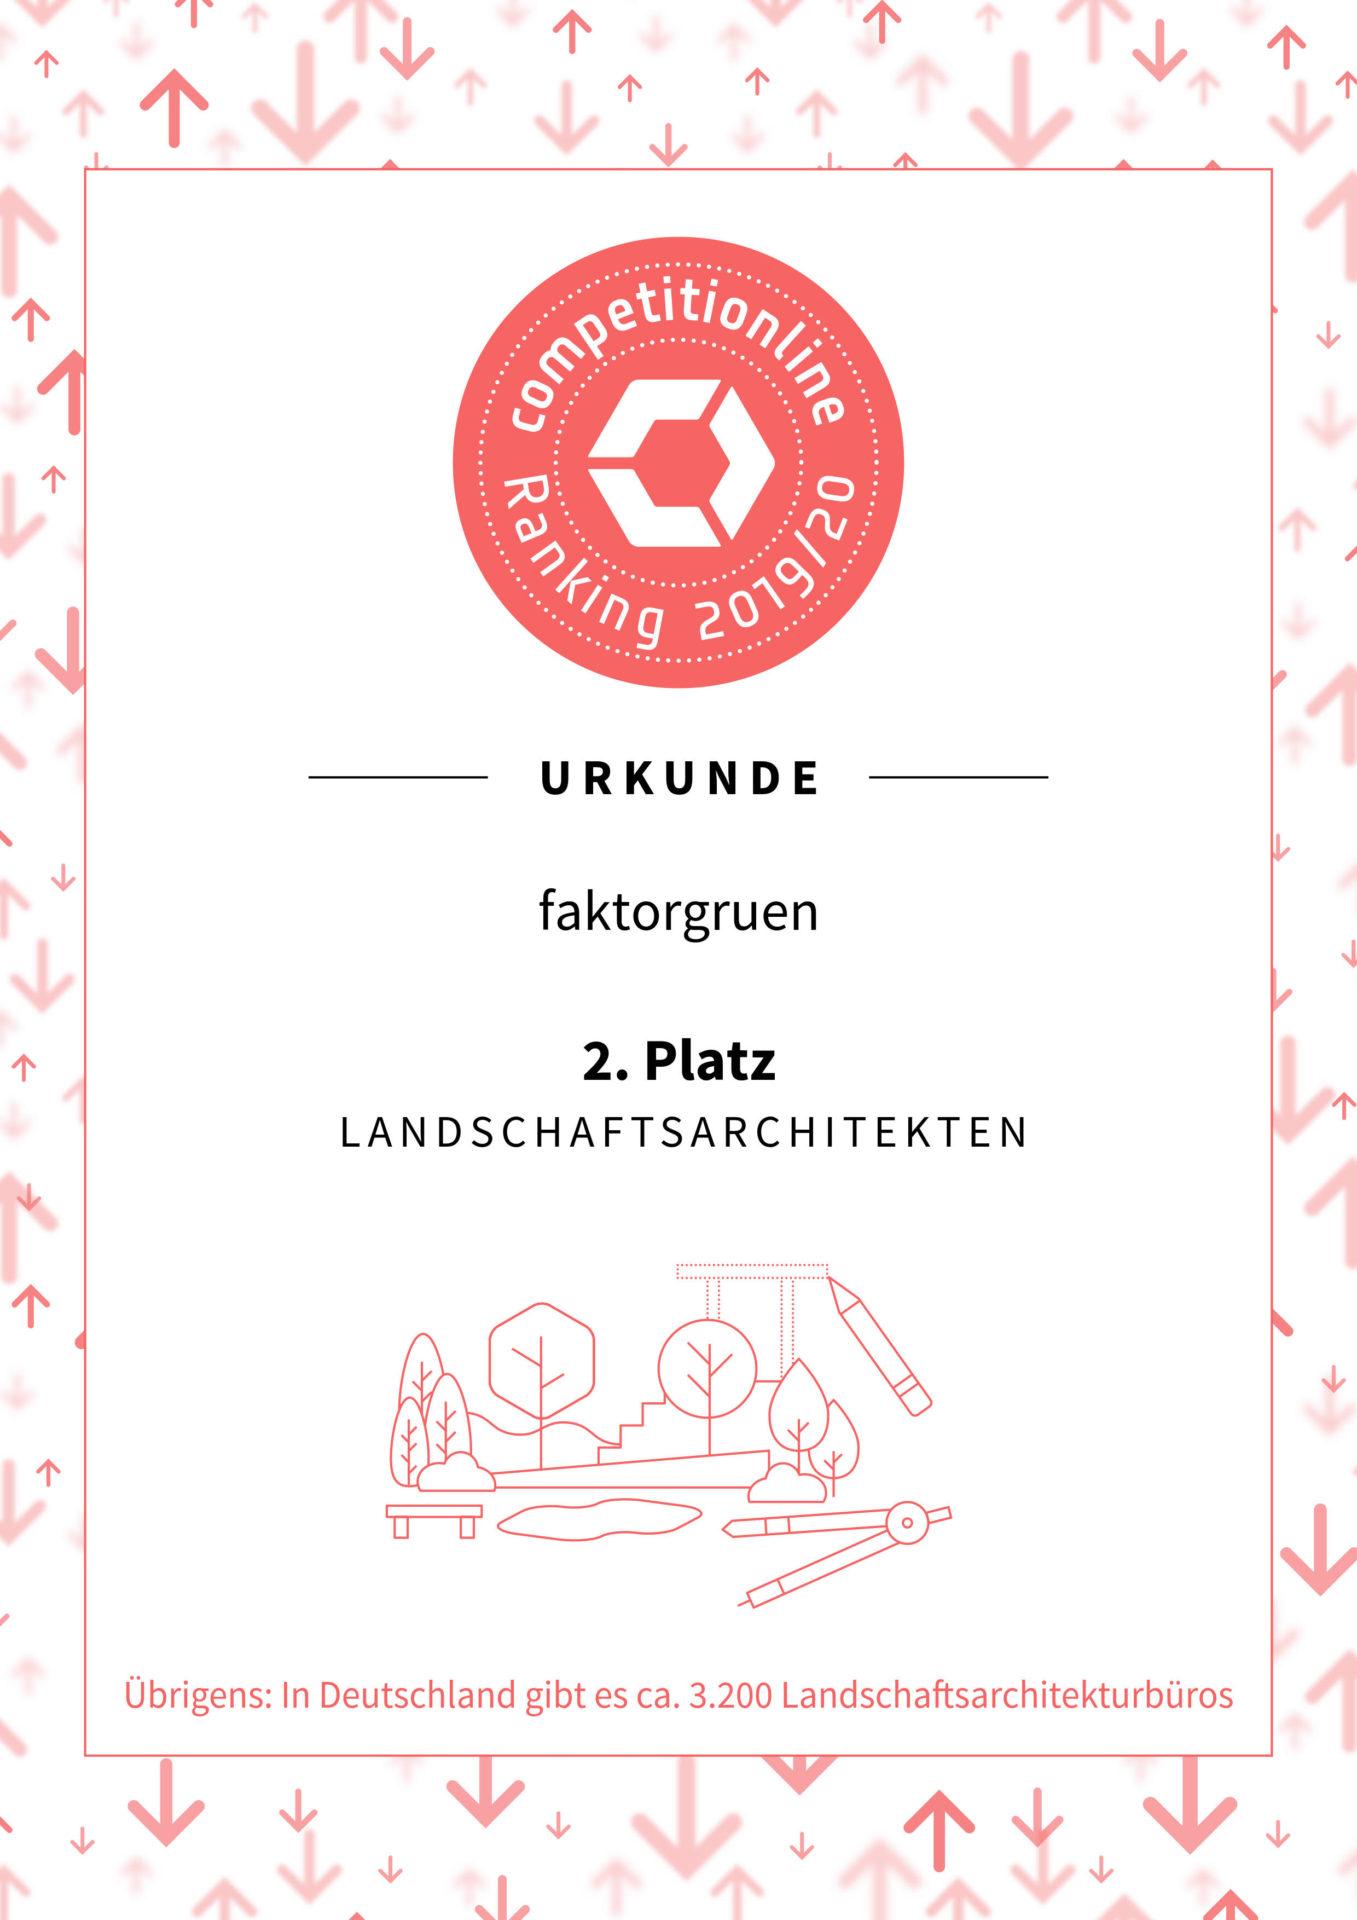 Competitionline Ranking Urkunde 2019/2020